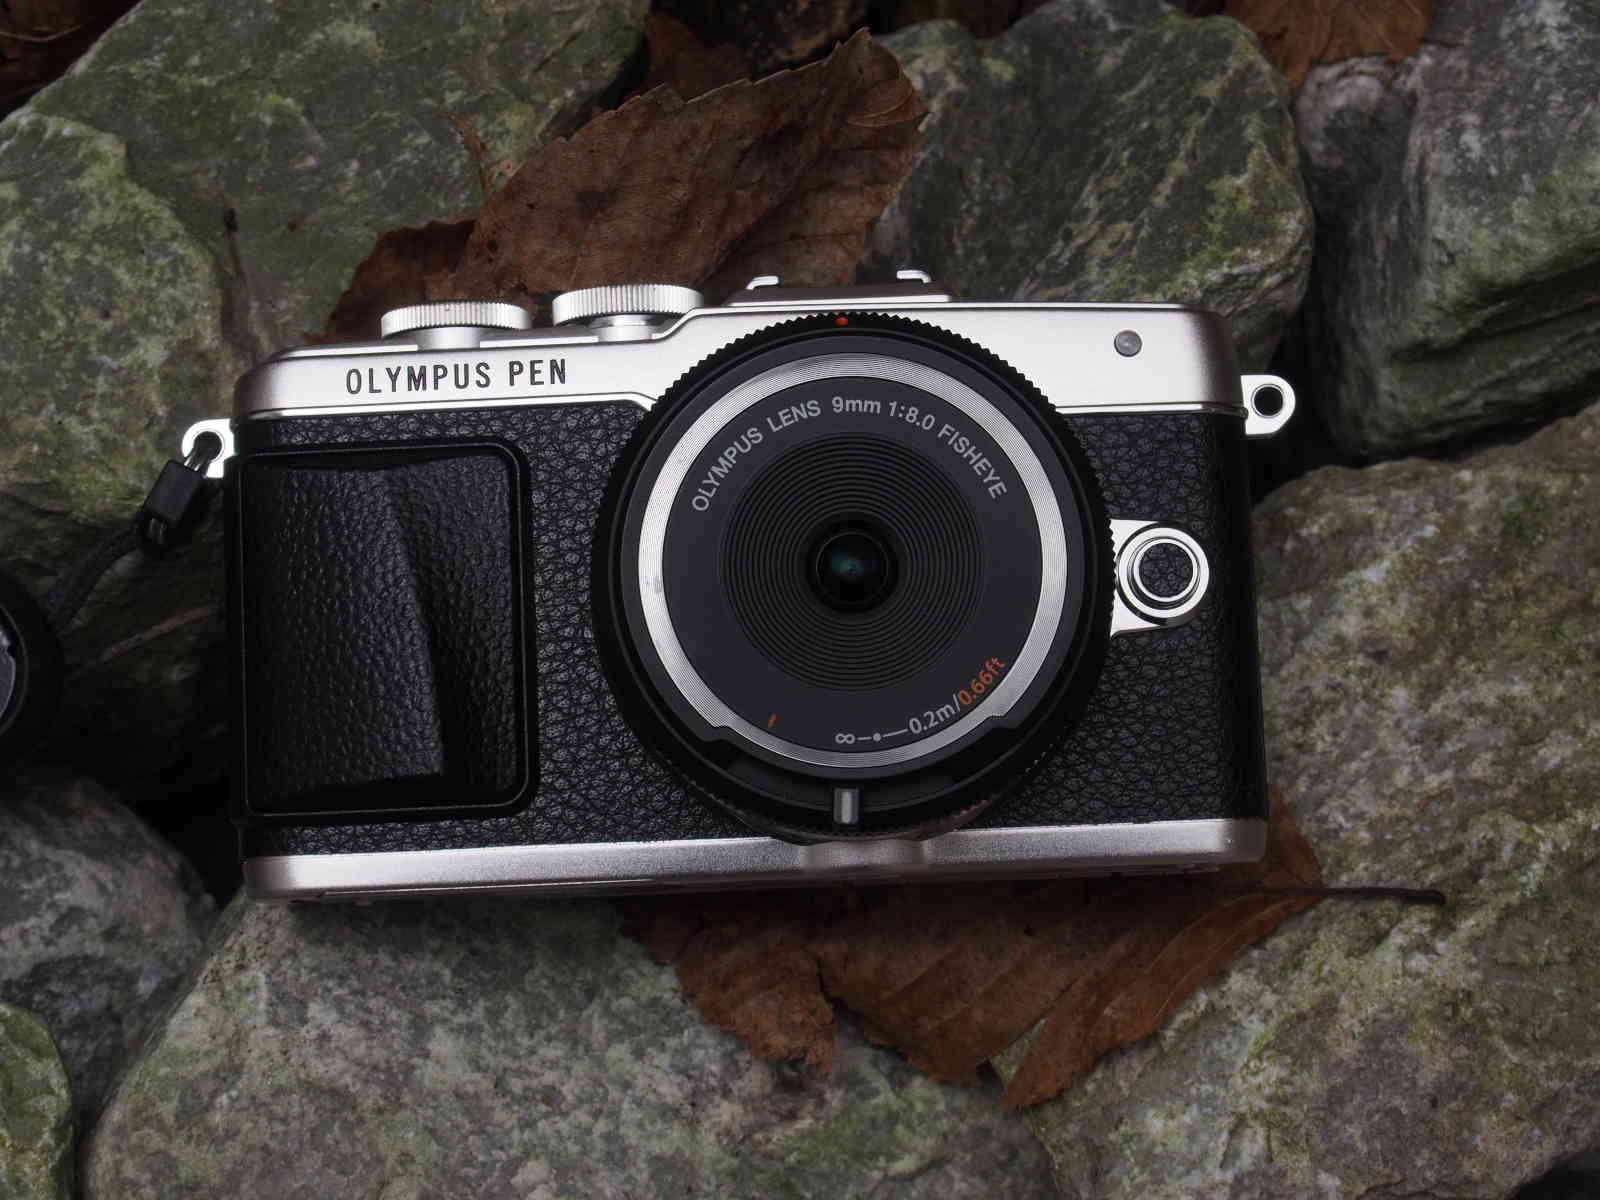 Olympus Body Lens Cap 9mm 1:8,0 an der Olympus PEN E-PL7